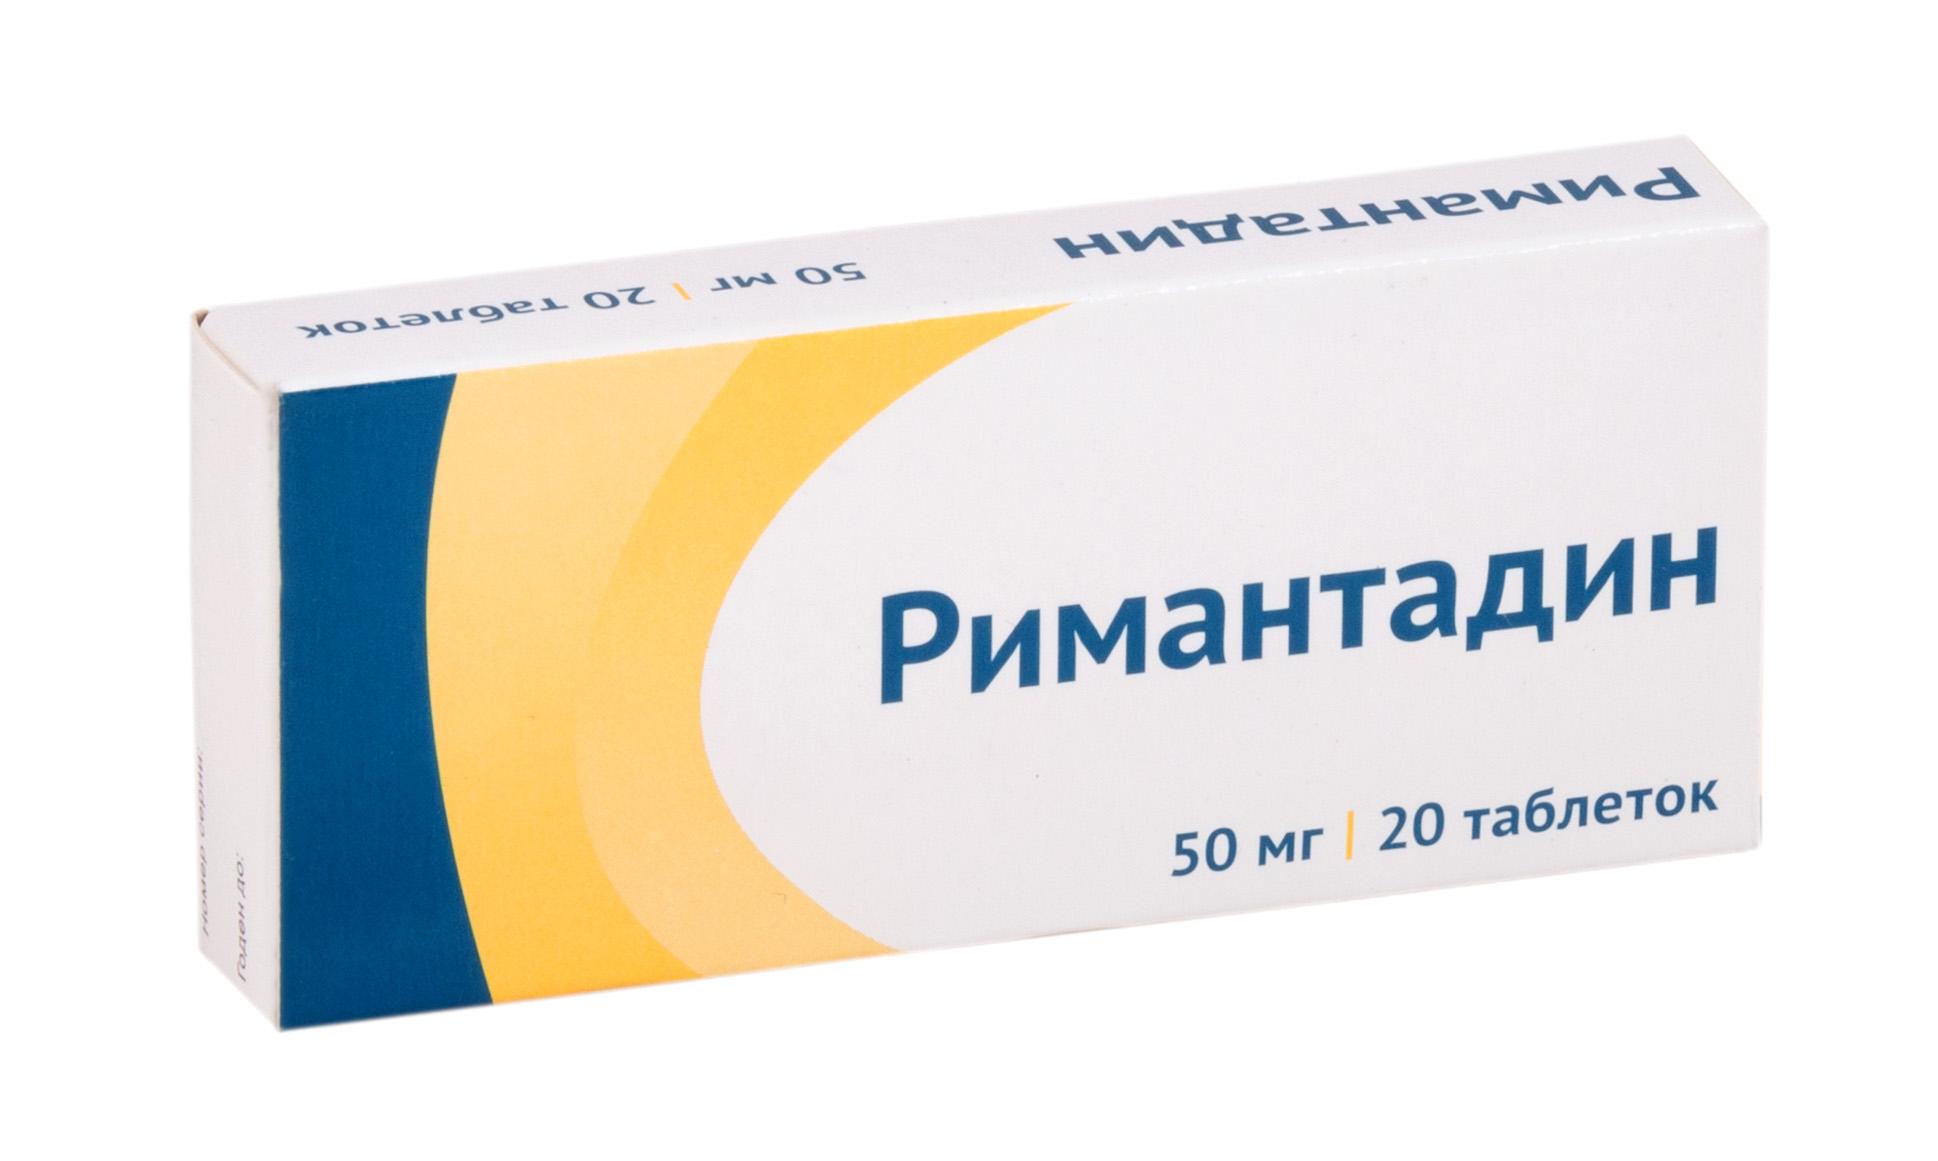 Римантадин таблетки 50мг №20 Озон